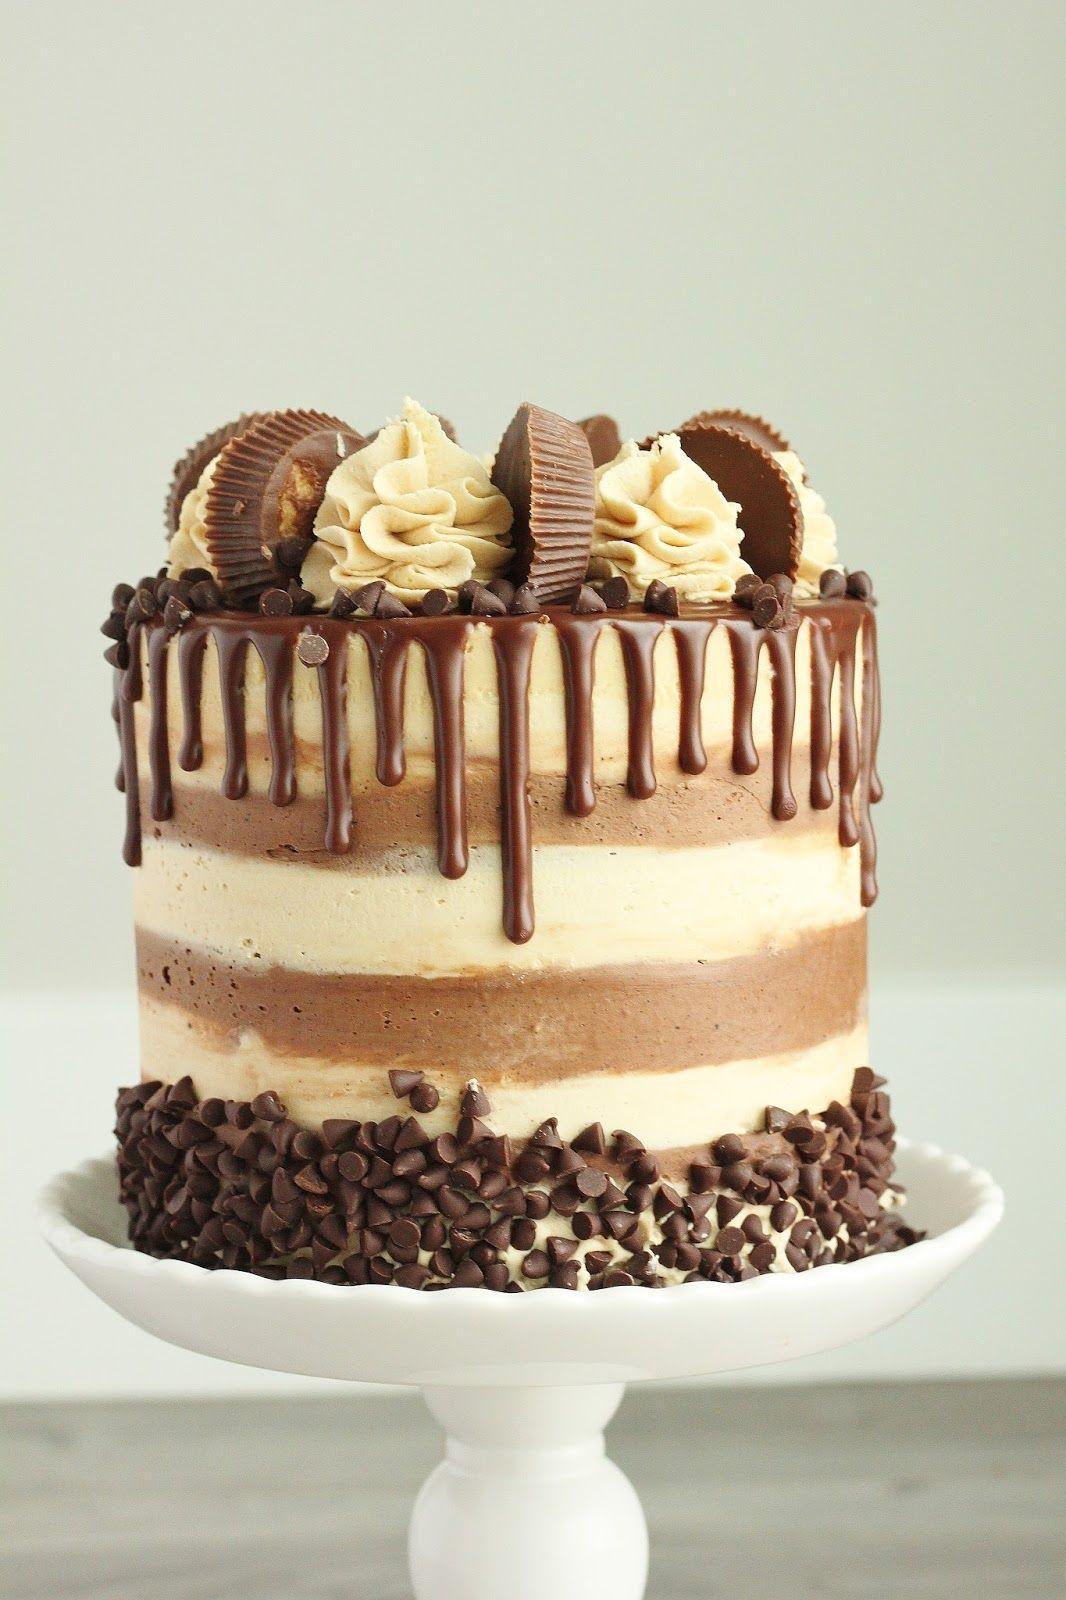 Fabulous Peanut Butter Chocolate Cake No Bake Cake Cake Recipes Savoury Funny Birthday Cards Online Inifofree Goldxyz